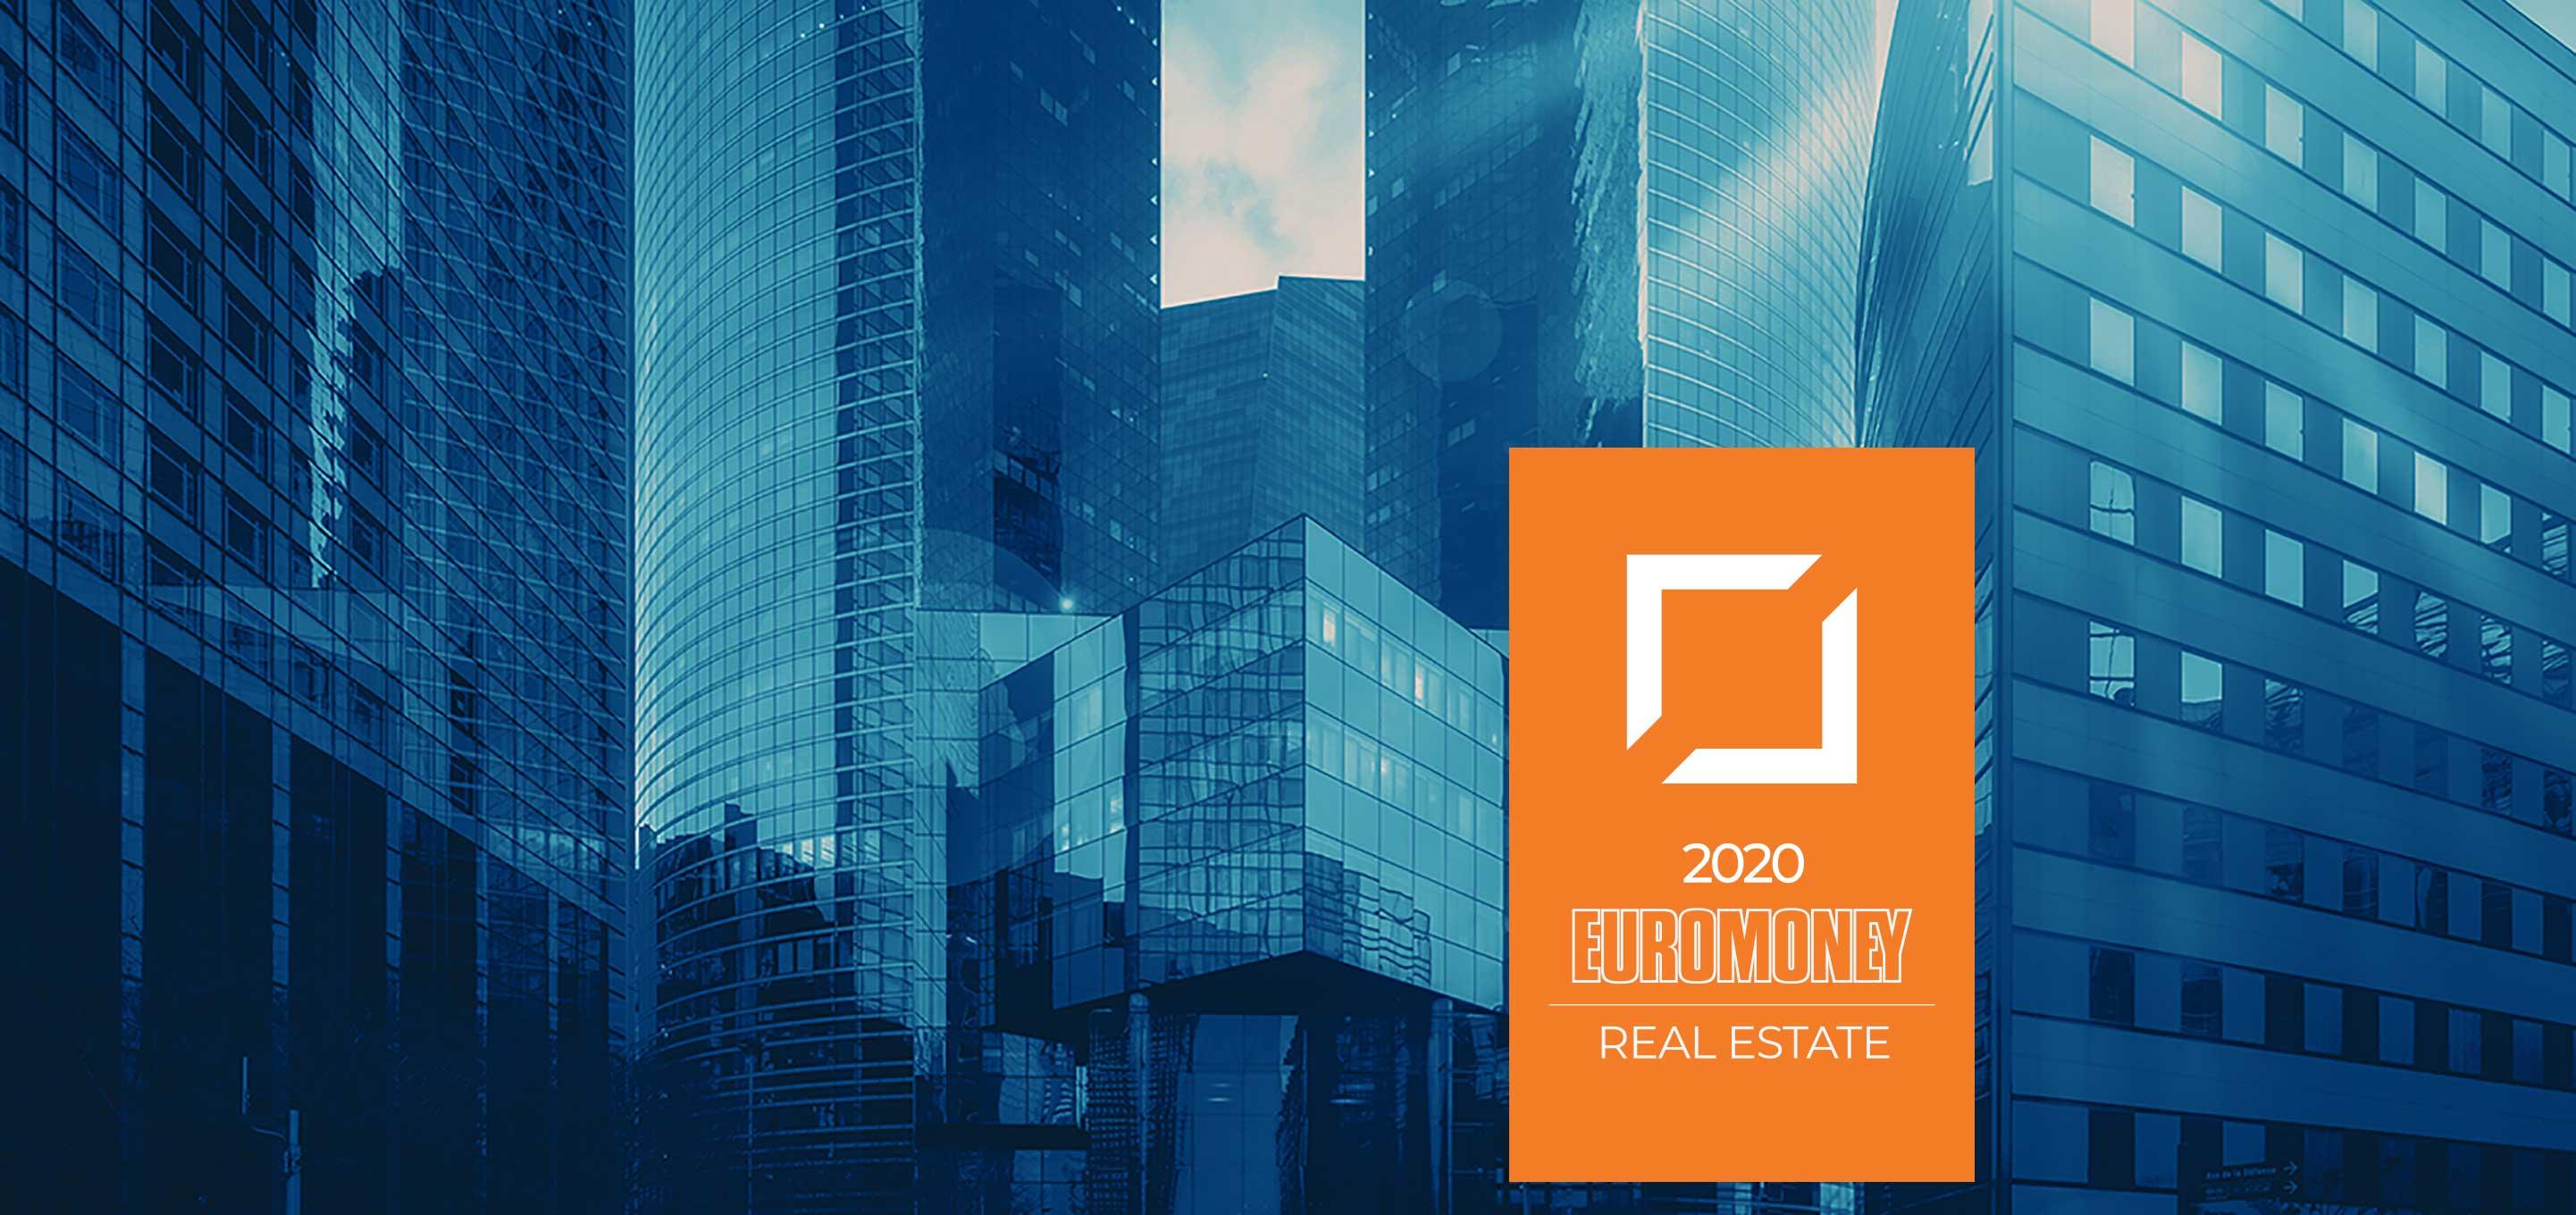 C&W-mejor-asesor-inmobiliario-mundo-euromoney-2020